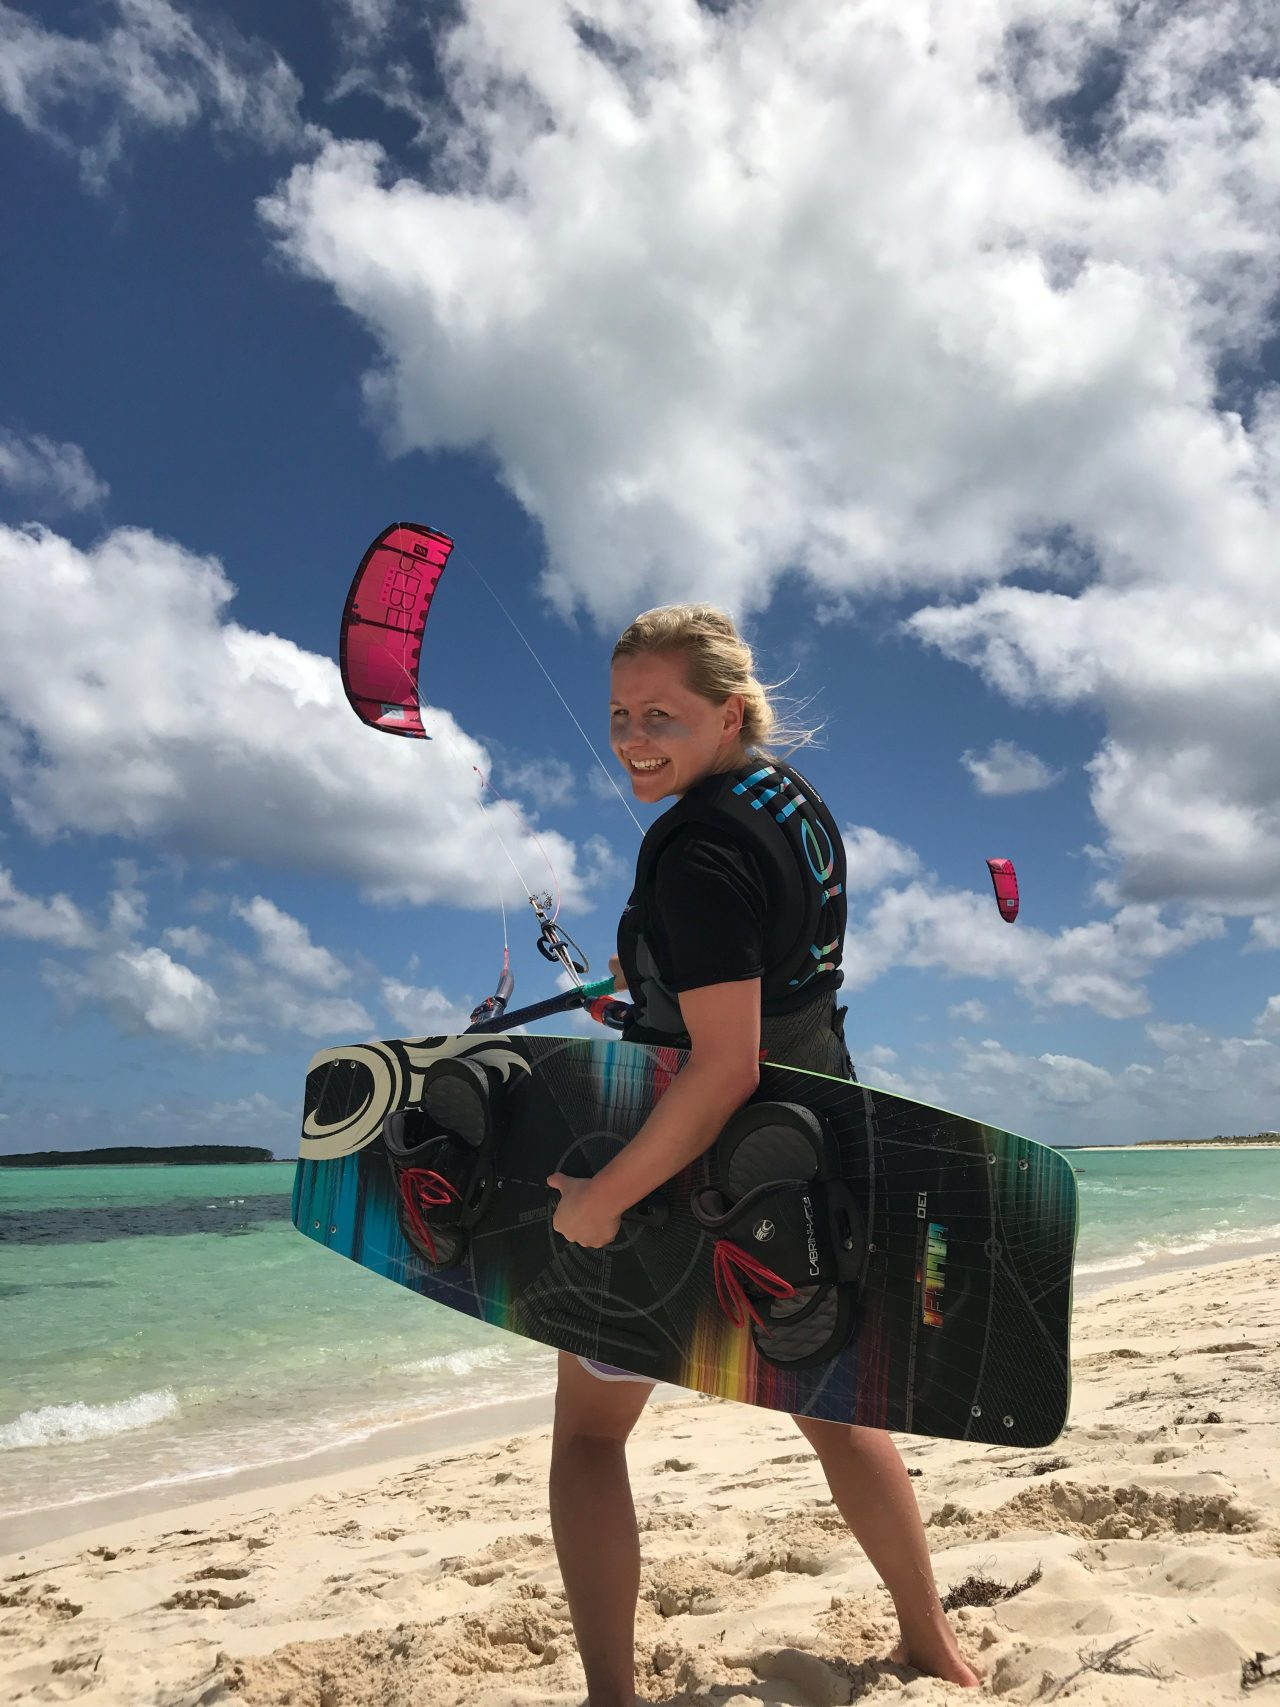 kite_urlaub_bahamas_san_salvador_kitesurfen